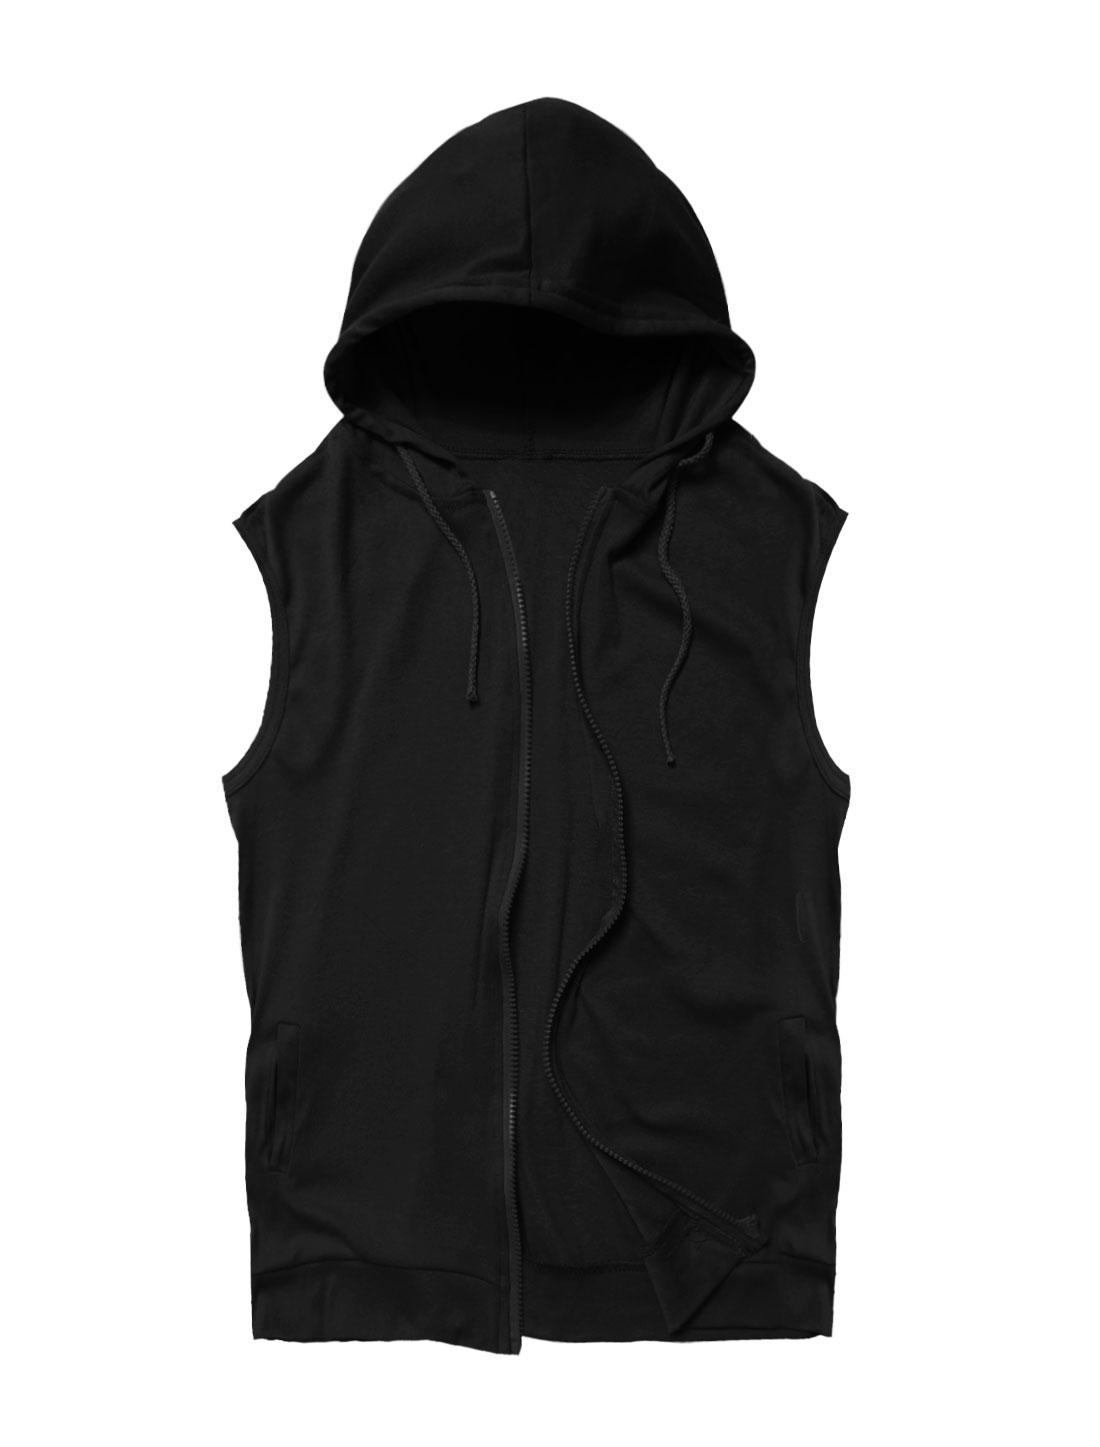 Men Hooded Sleeveless Zip Up Casual Vest Black S